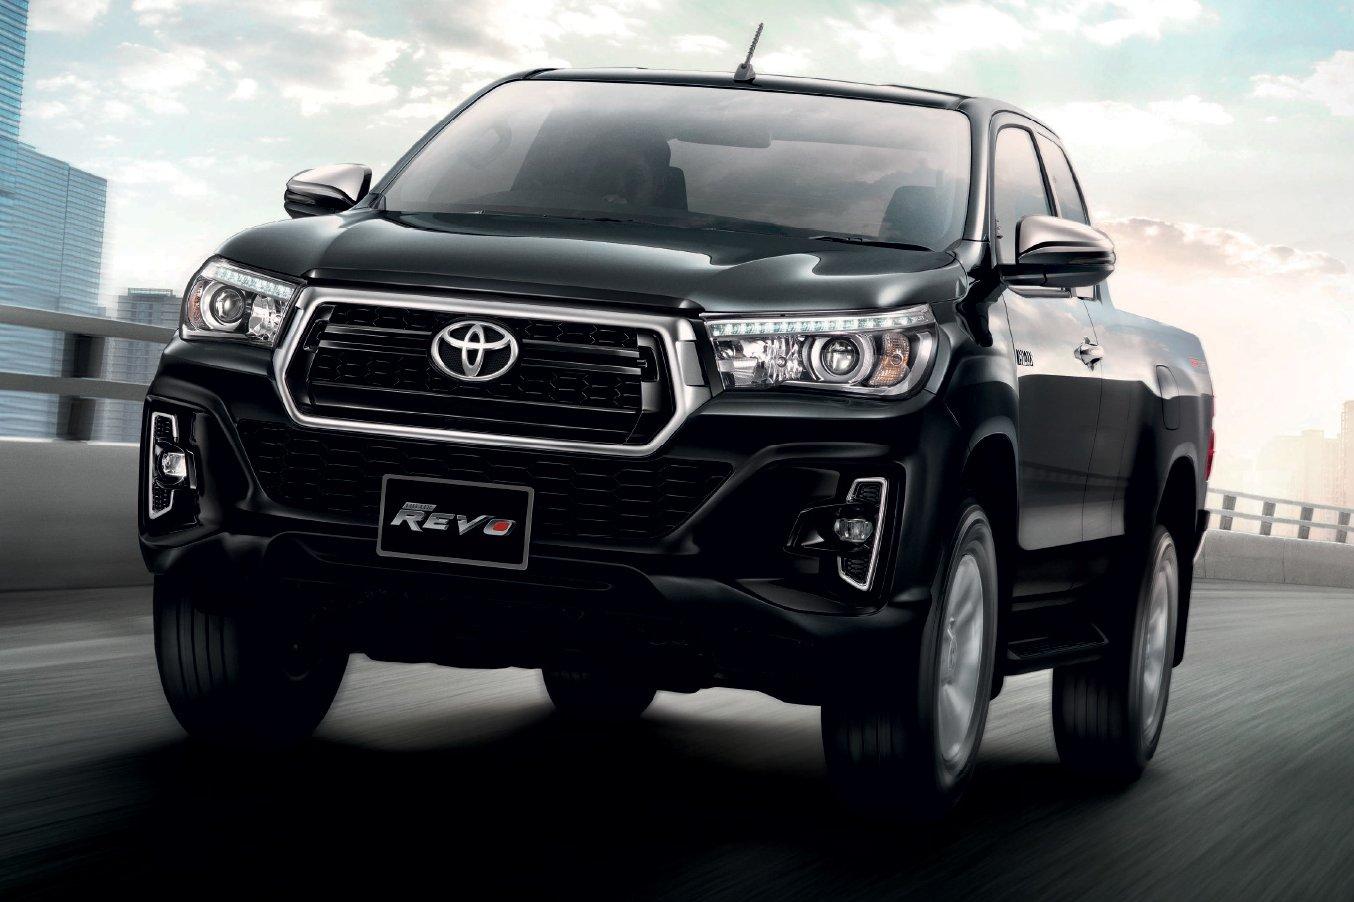 Kelebihan Kekurangan Toyota Hilux 2018 Harga